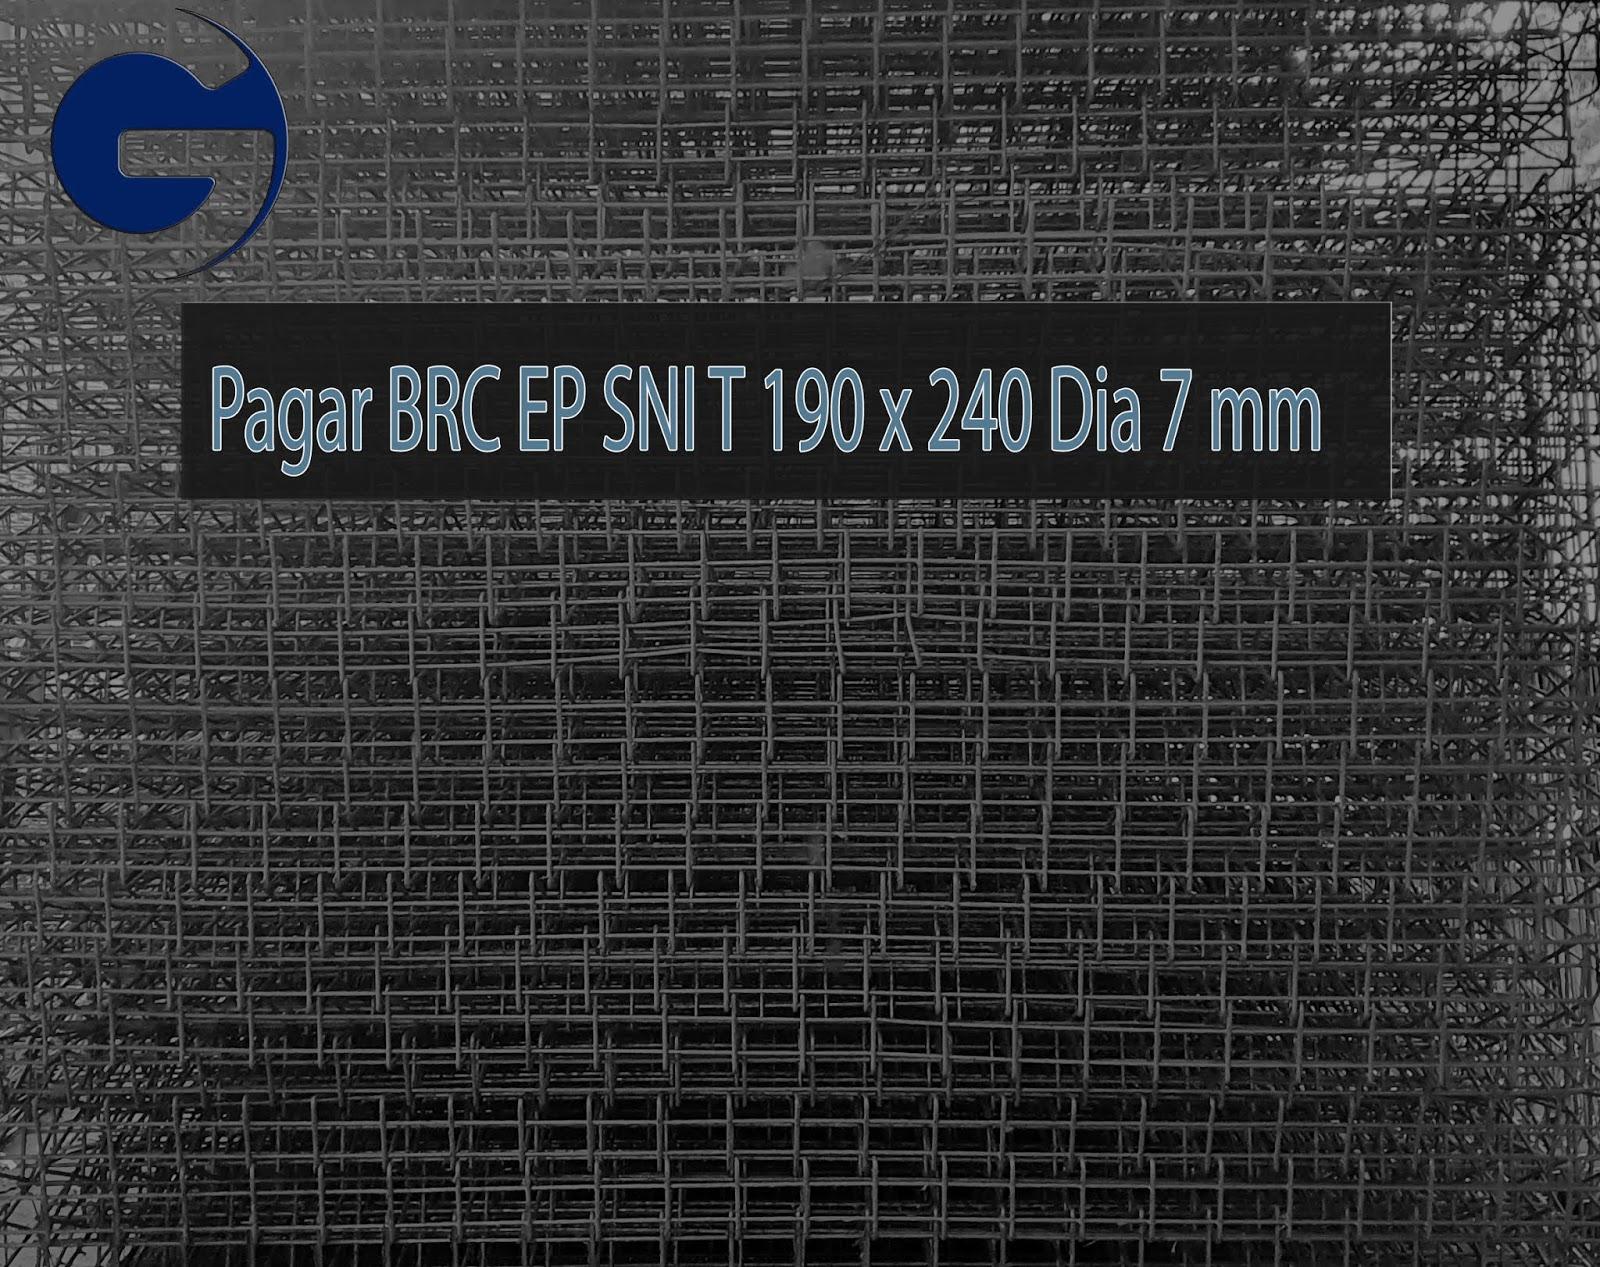 Jual Pagar BRC EP SNI T 190 x 240 Dia 7 mm